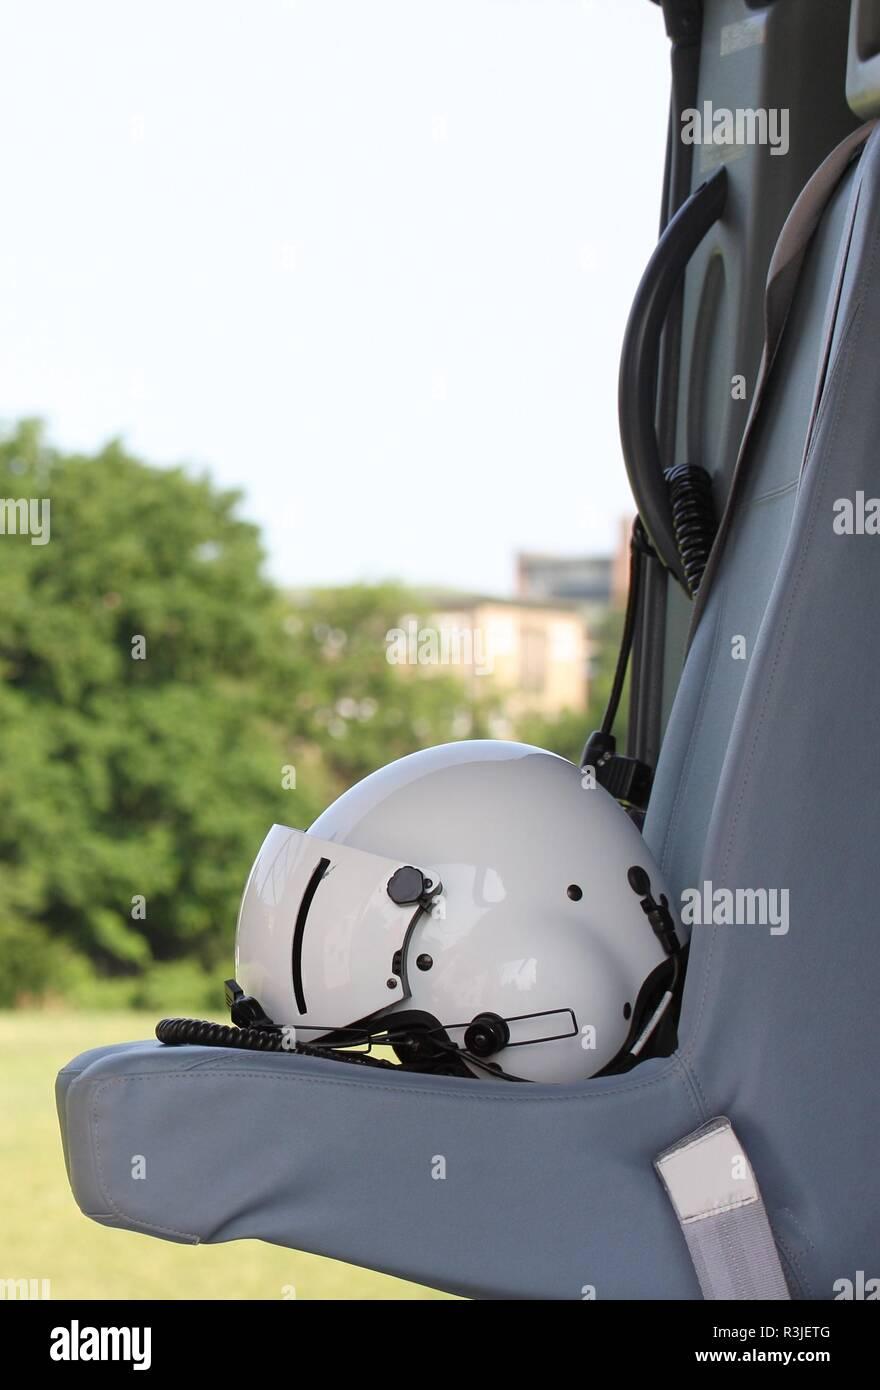 Pilot Helmet Stock Photos & Pilot Helmet Stock Images - Alamy